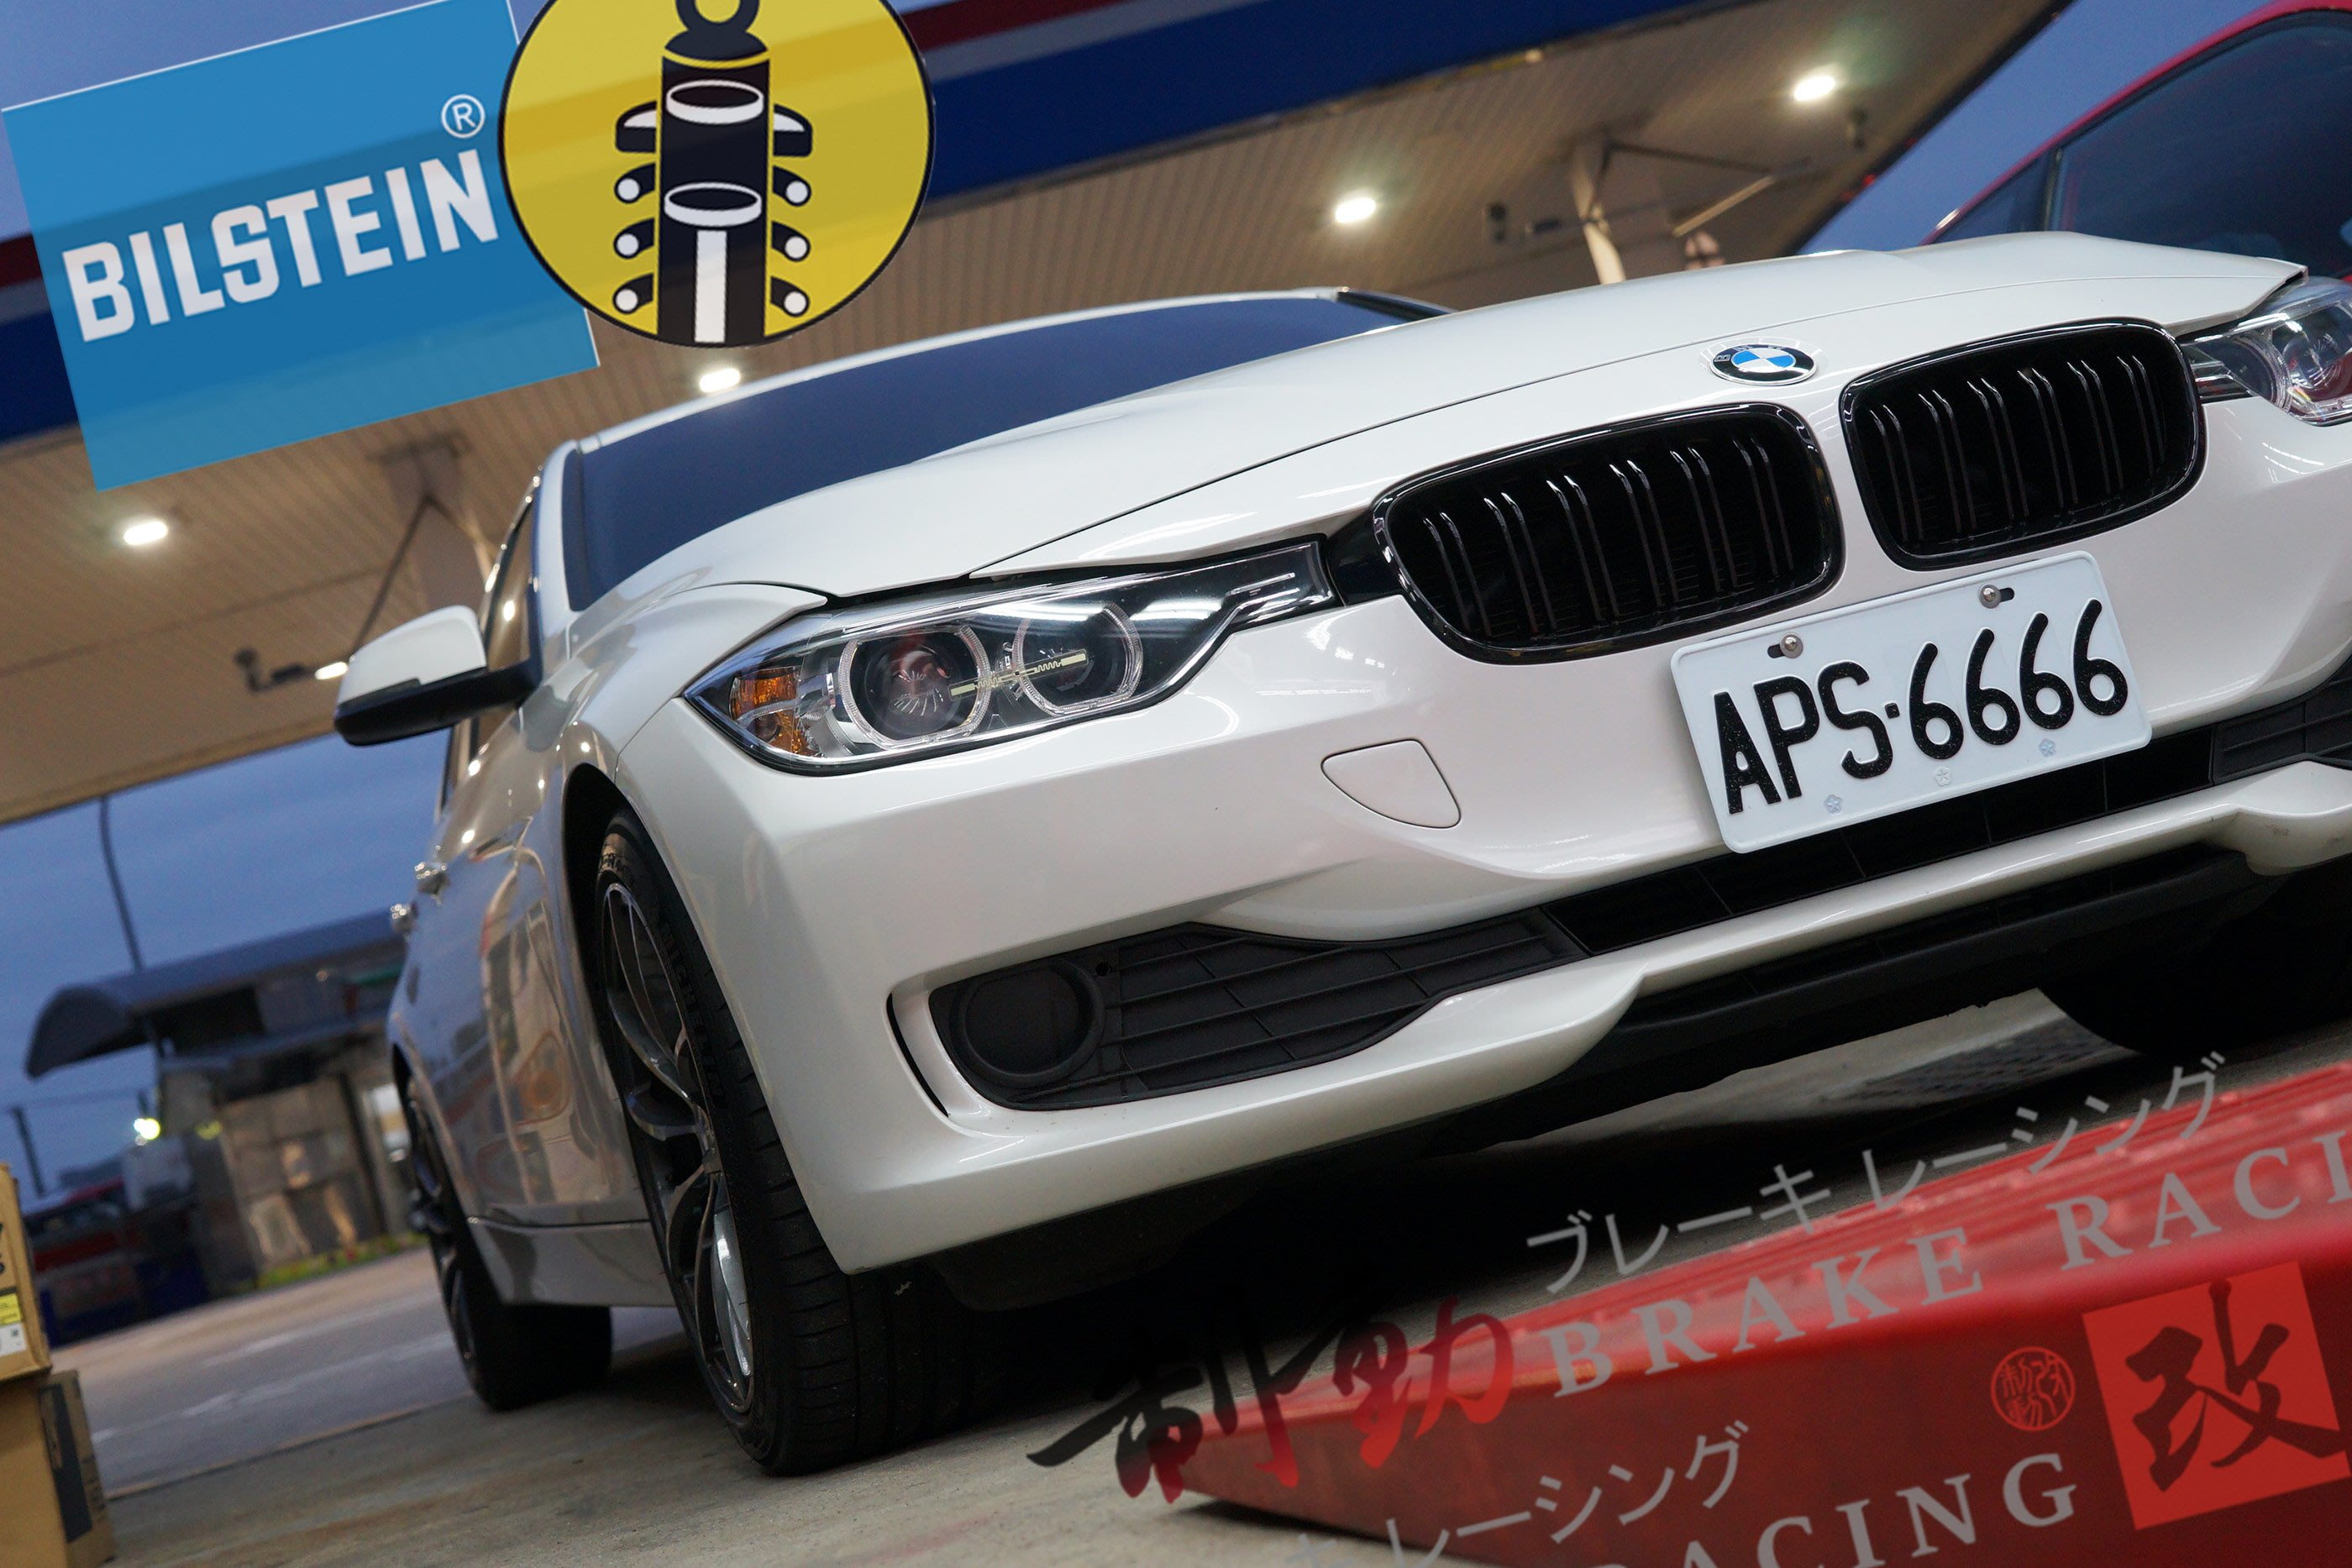 BMW F30/F31 倍適登避震 BILSTEIN B12 + Eibach Pro-Kit 套裝組  / 制動改